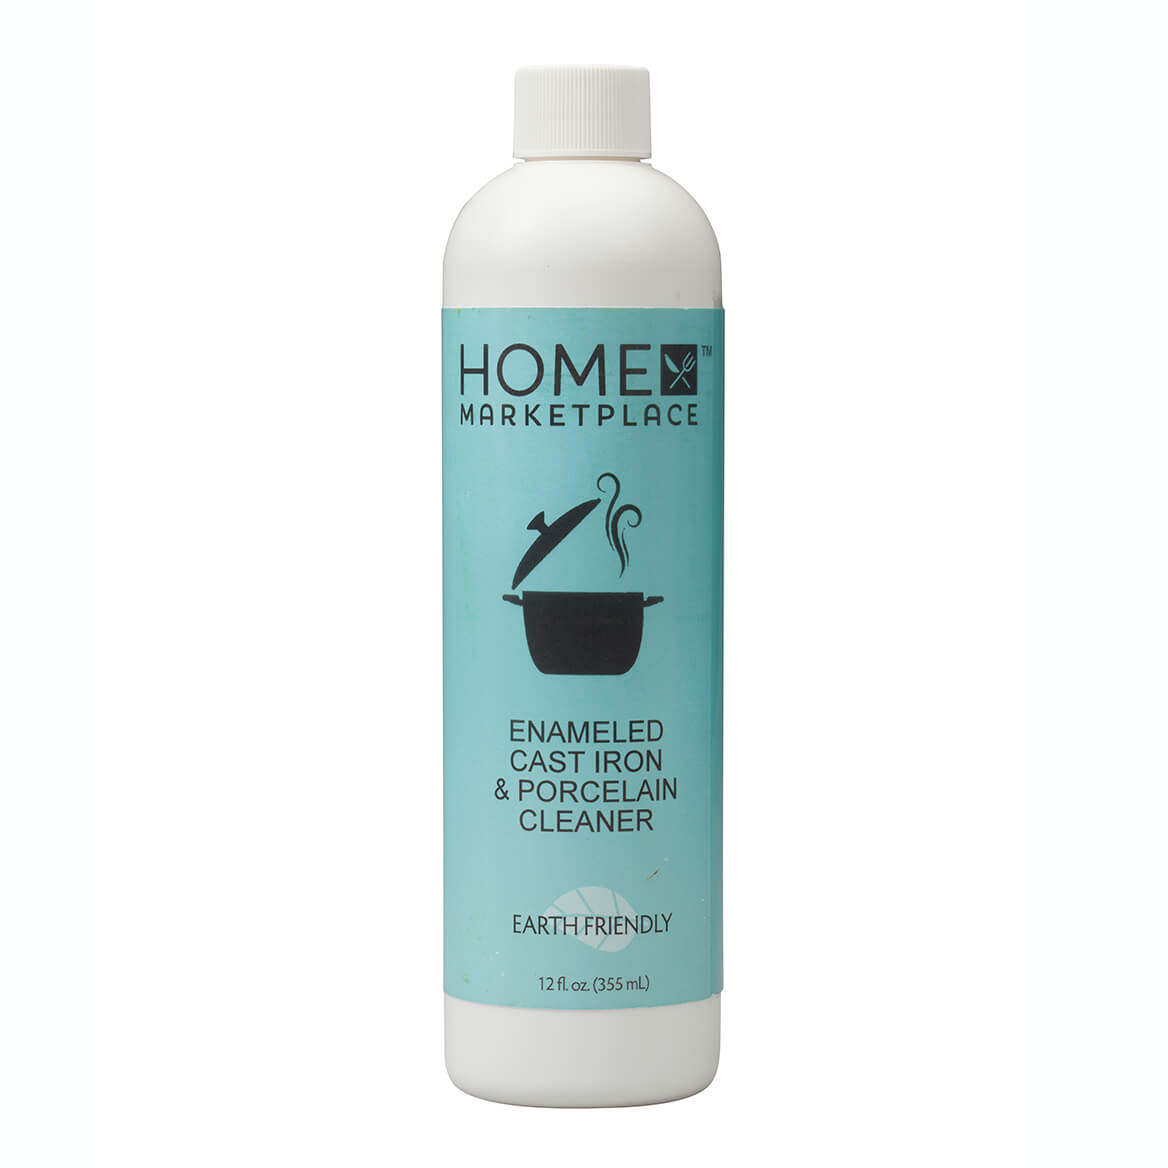 Home Marketplace™ Enameled Cast Iron & Porcelain Cleaner-363033